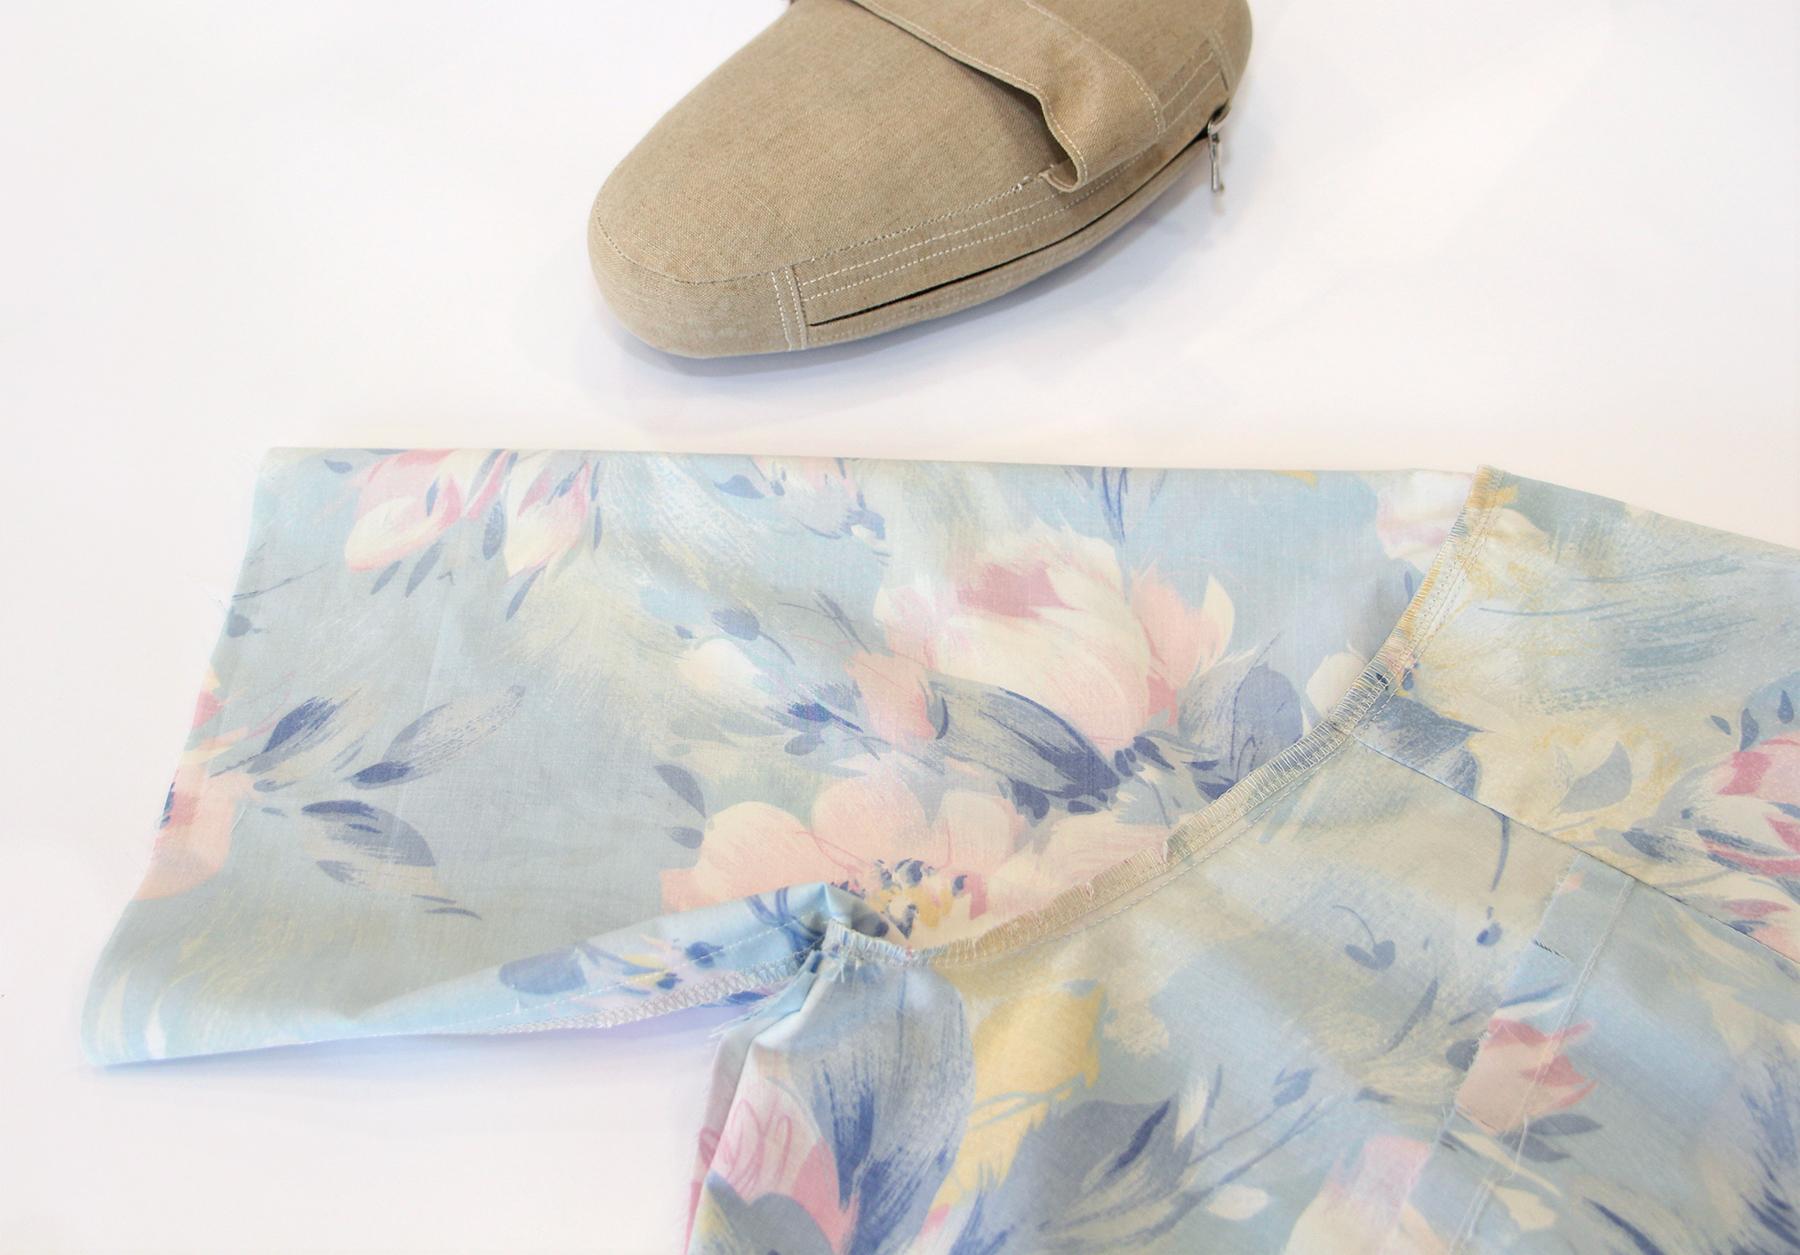 Megan Nielsen Patterns | Matilda Sewalong: Sleeves - Finishing Your Sleeve Seam & Pressing